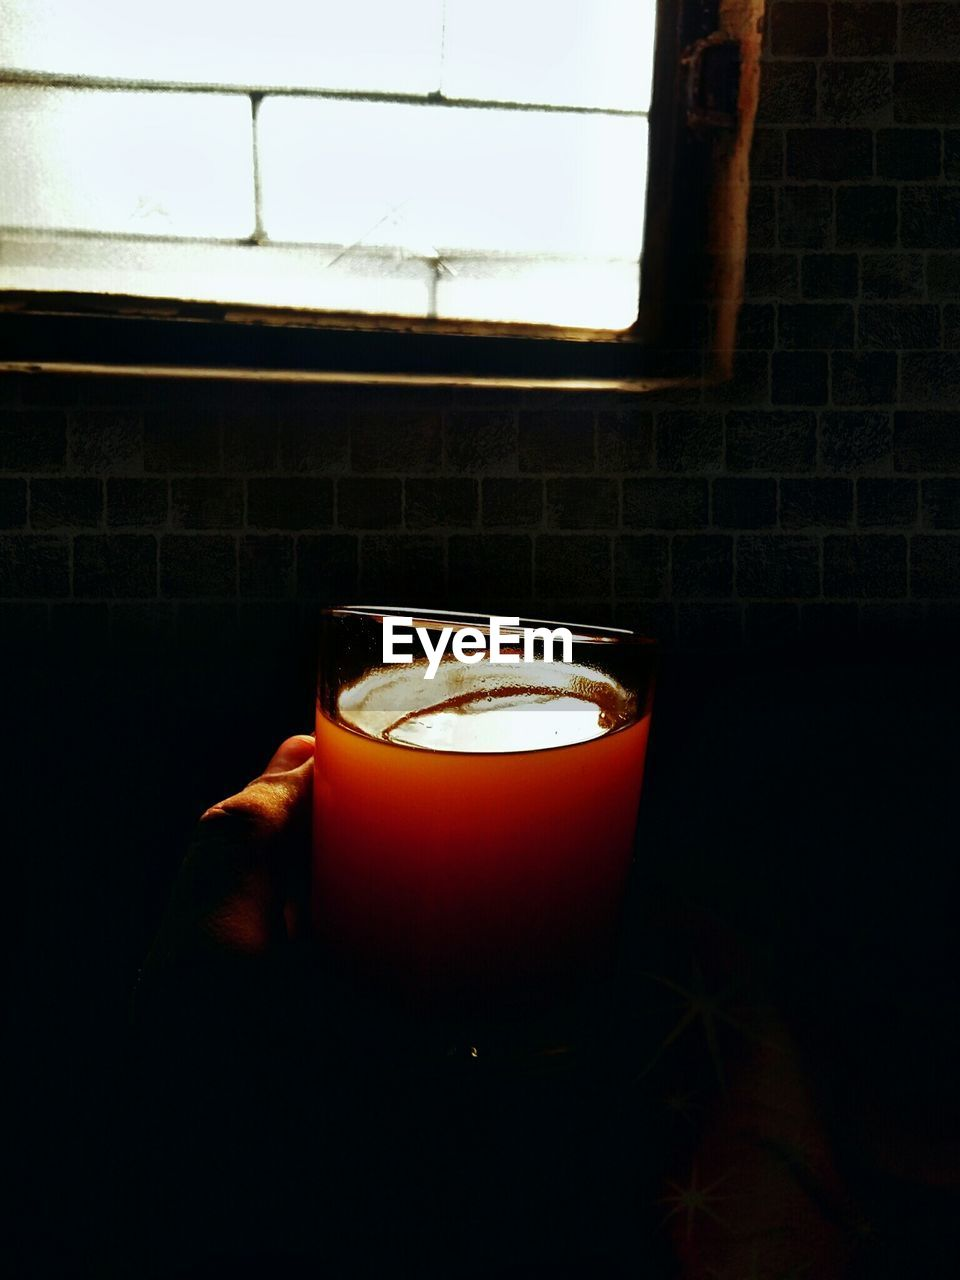 candle, flame, indoors, illuminated, burning, brick wall, window, no people, heat - temperature, close-up, night